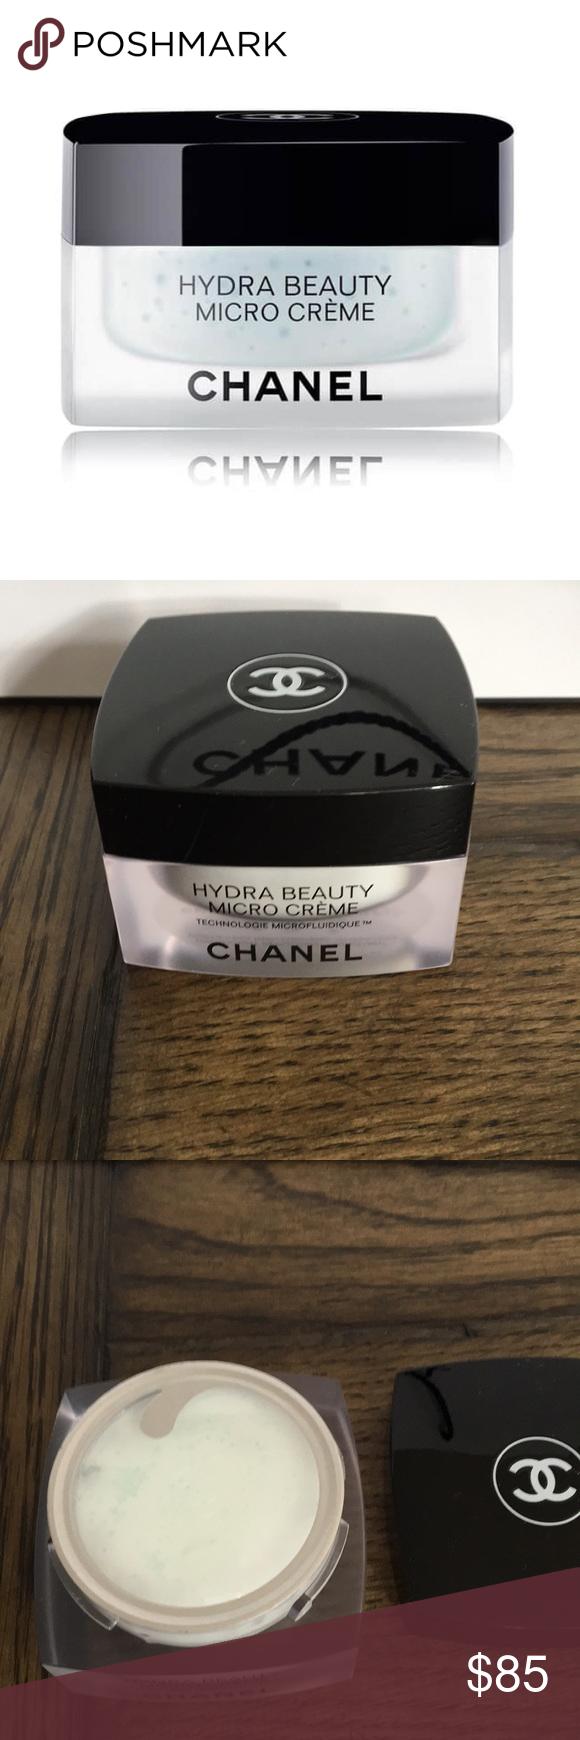 Chanel Hydra Beauty Micro Creme Brand New 100 Authentic Chanel Moisturizer Amazing Hydration Cream Chan Chanel Hydra Beauty Chanel Moisturizer Chanel Makeup